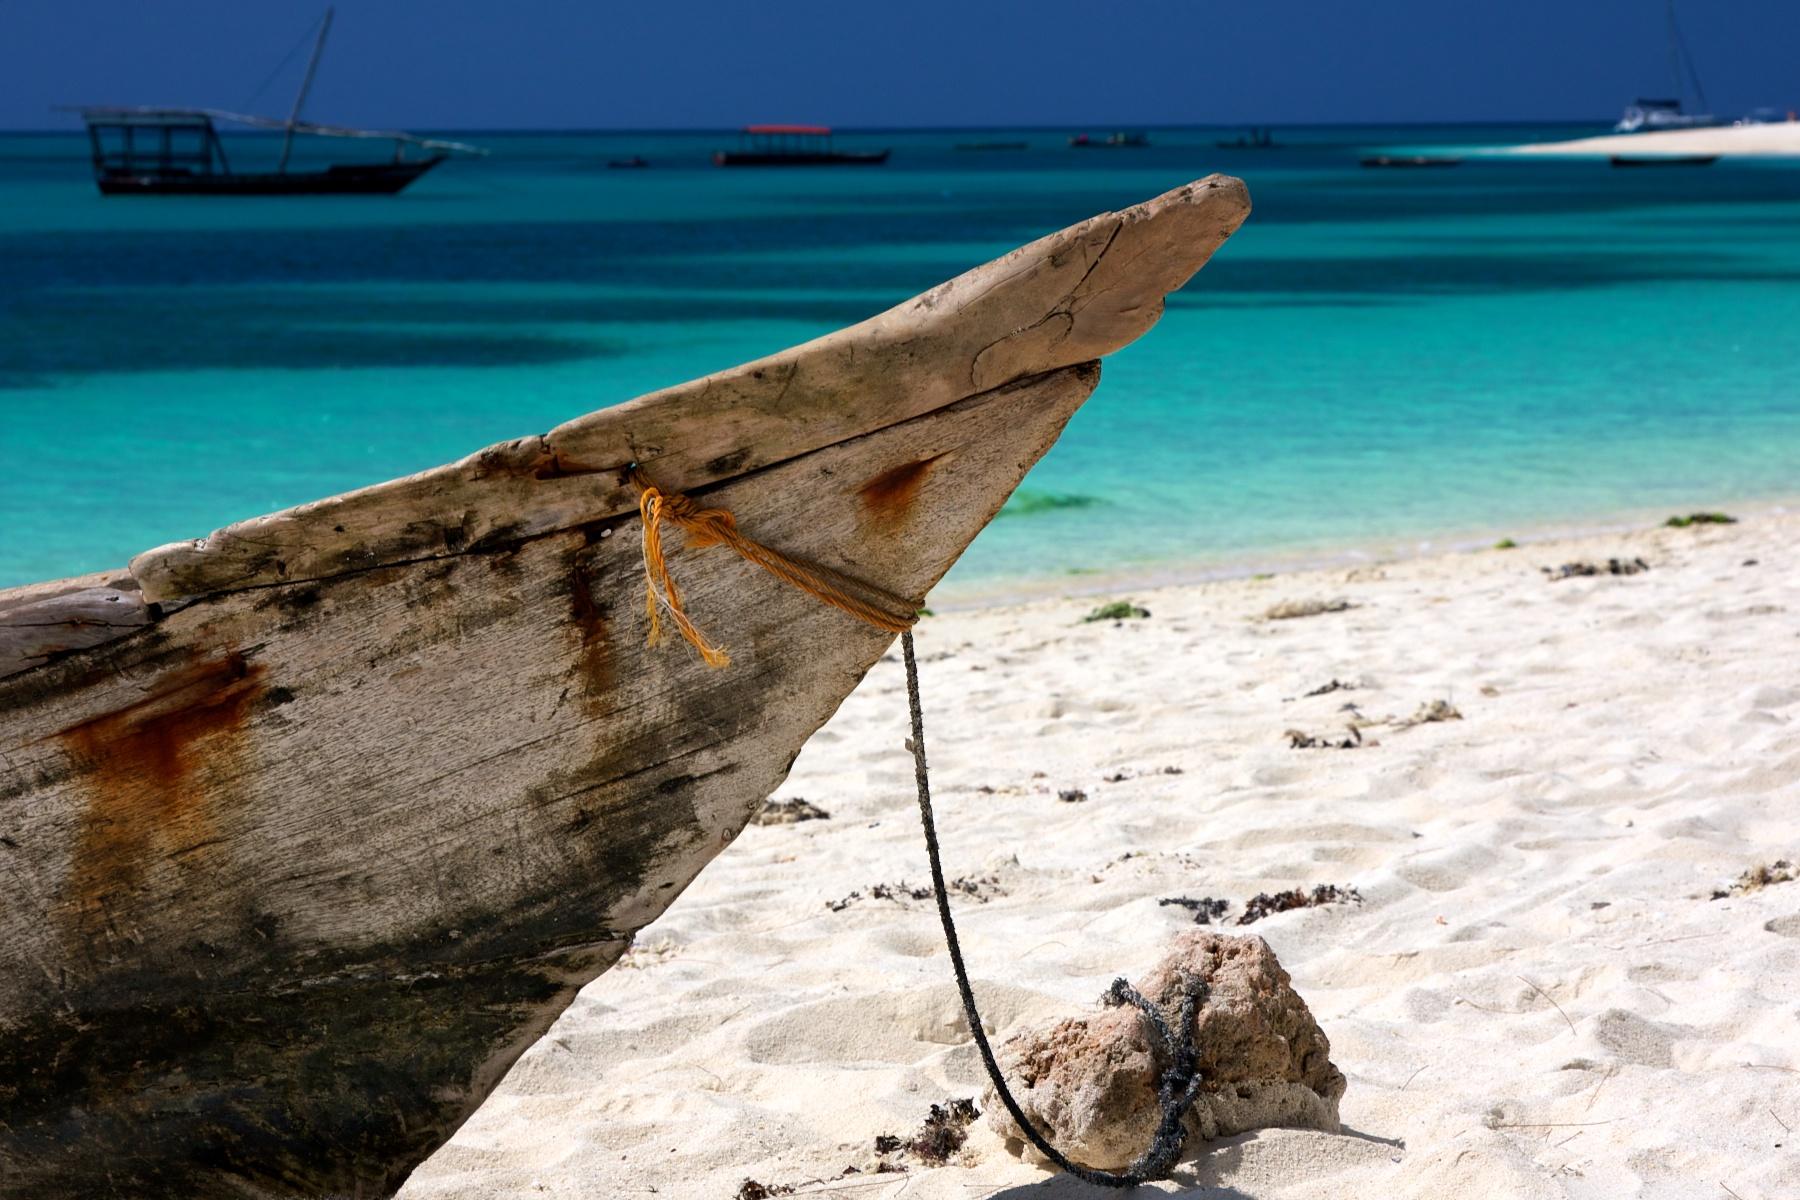 A rest on the beach...